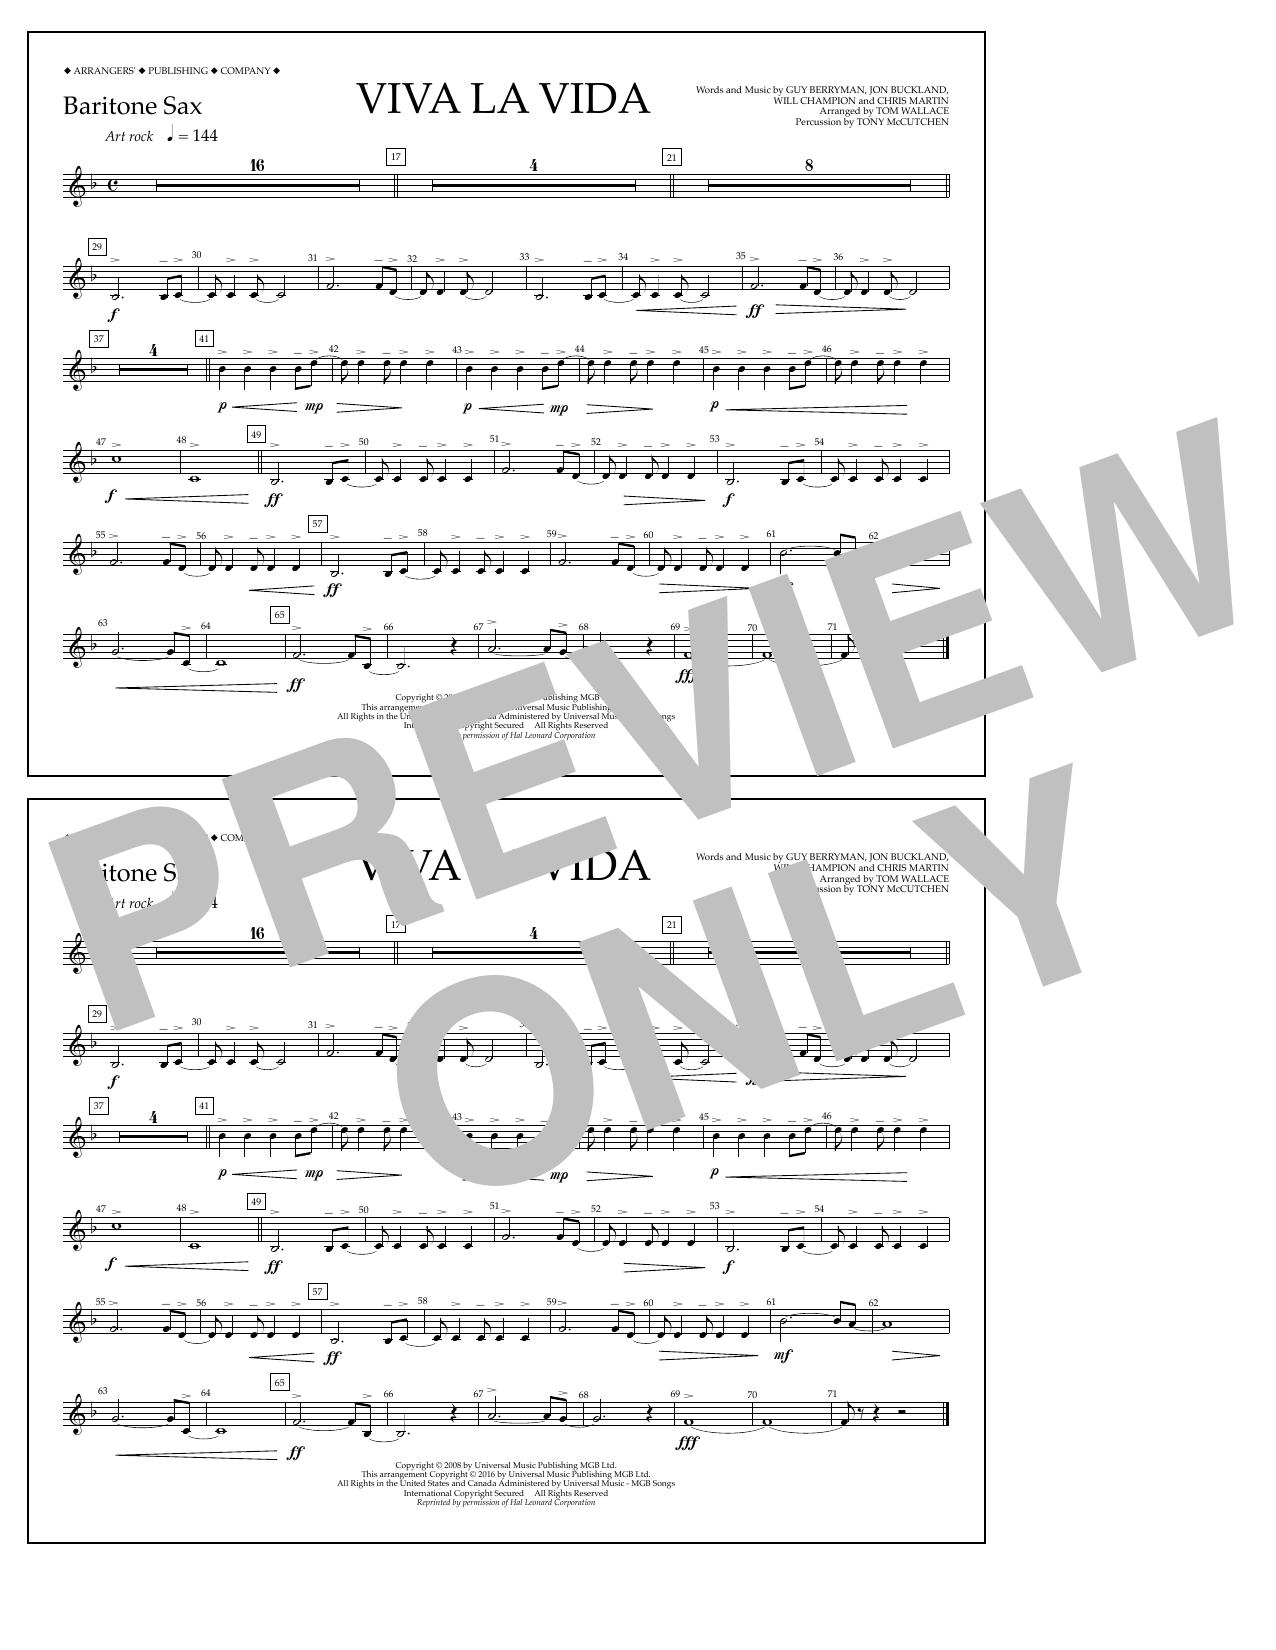 Coldplay - Viva La Vida - Baritone Sax